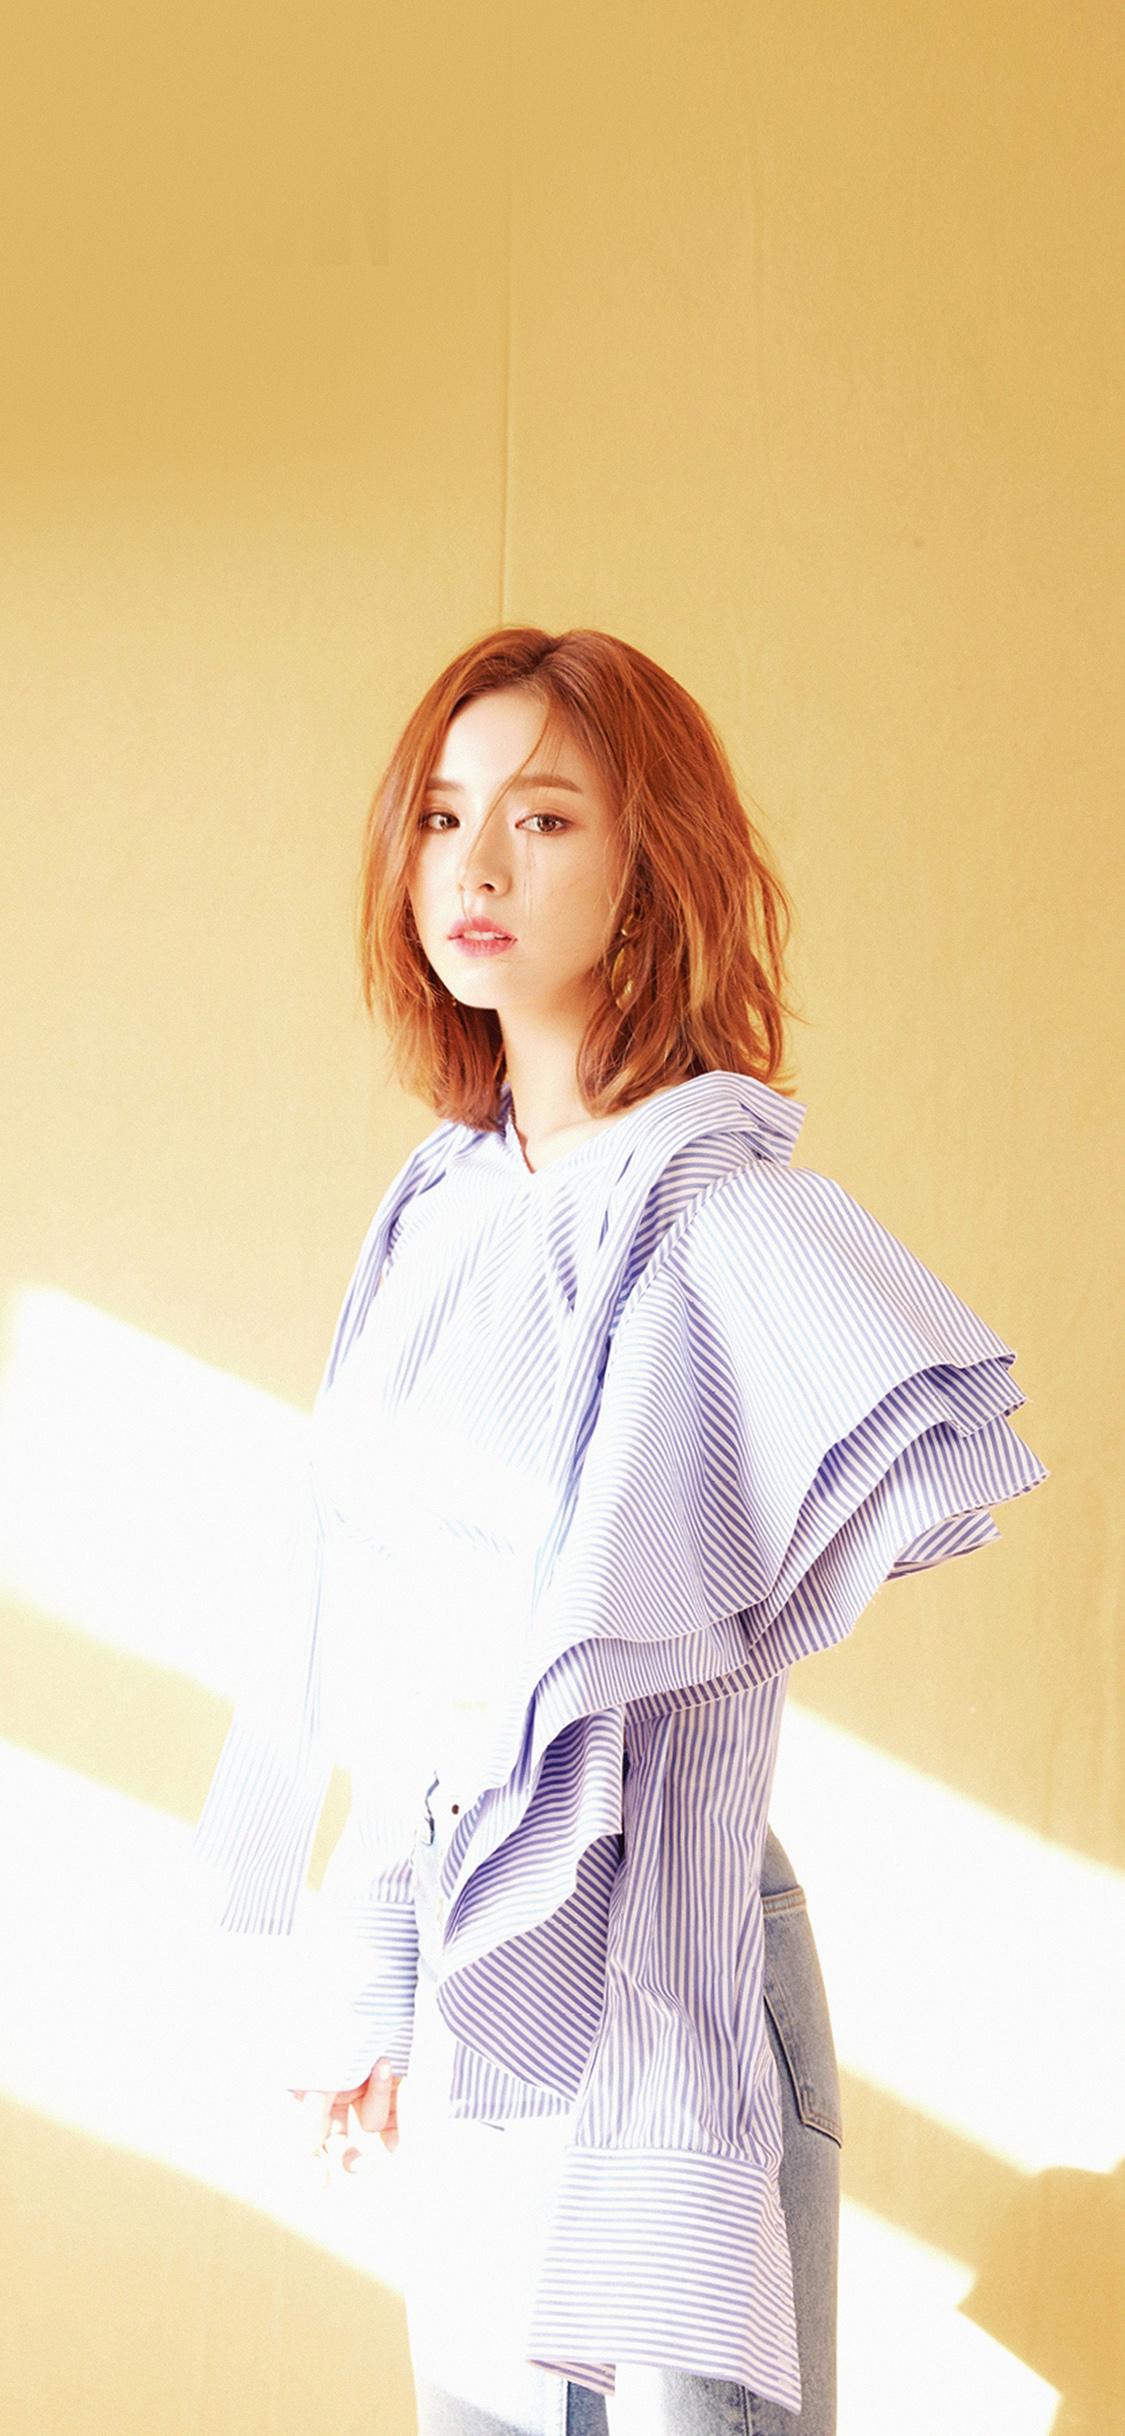 Cute Korean Wallpaper For Android Ho19 Girl Korean Asian Cute Wallpaper